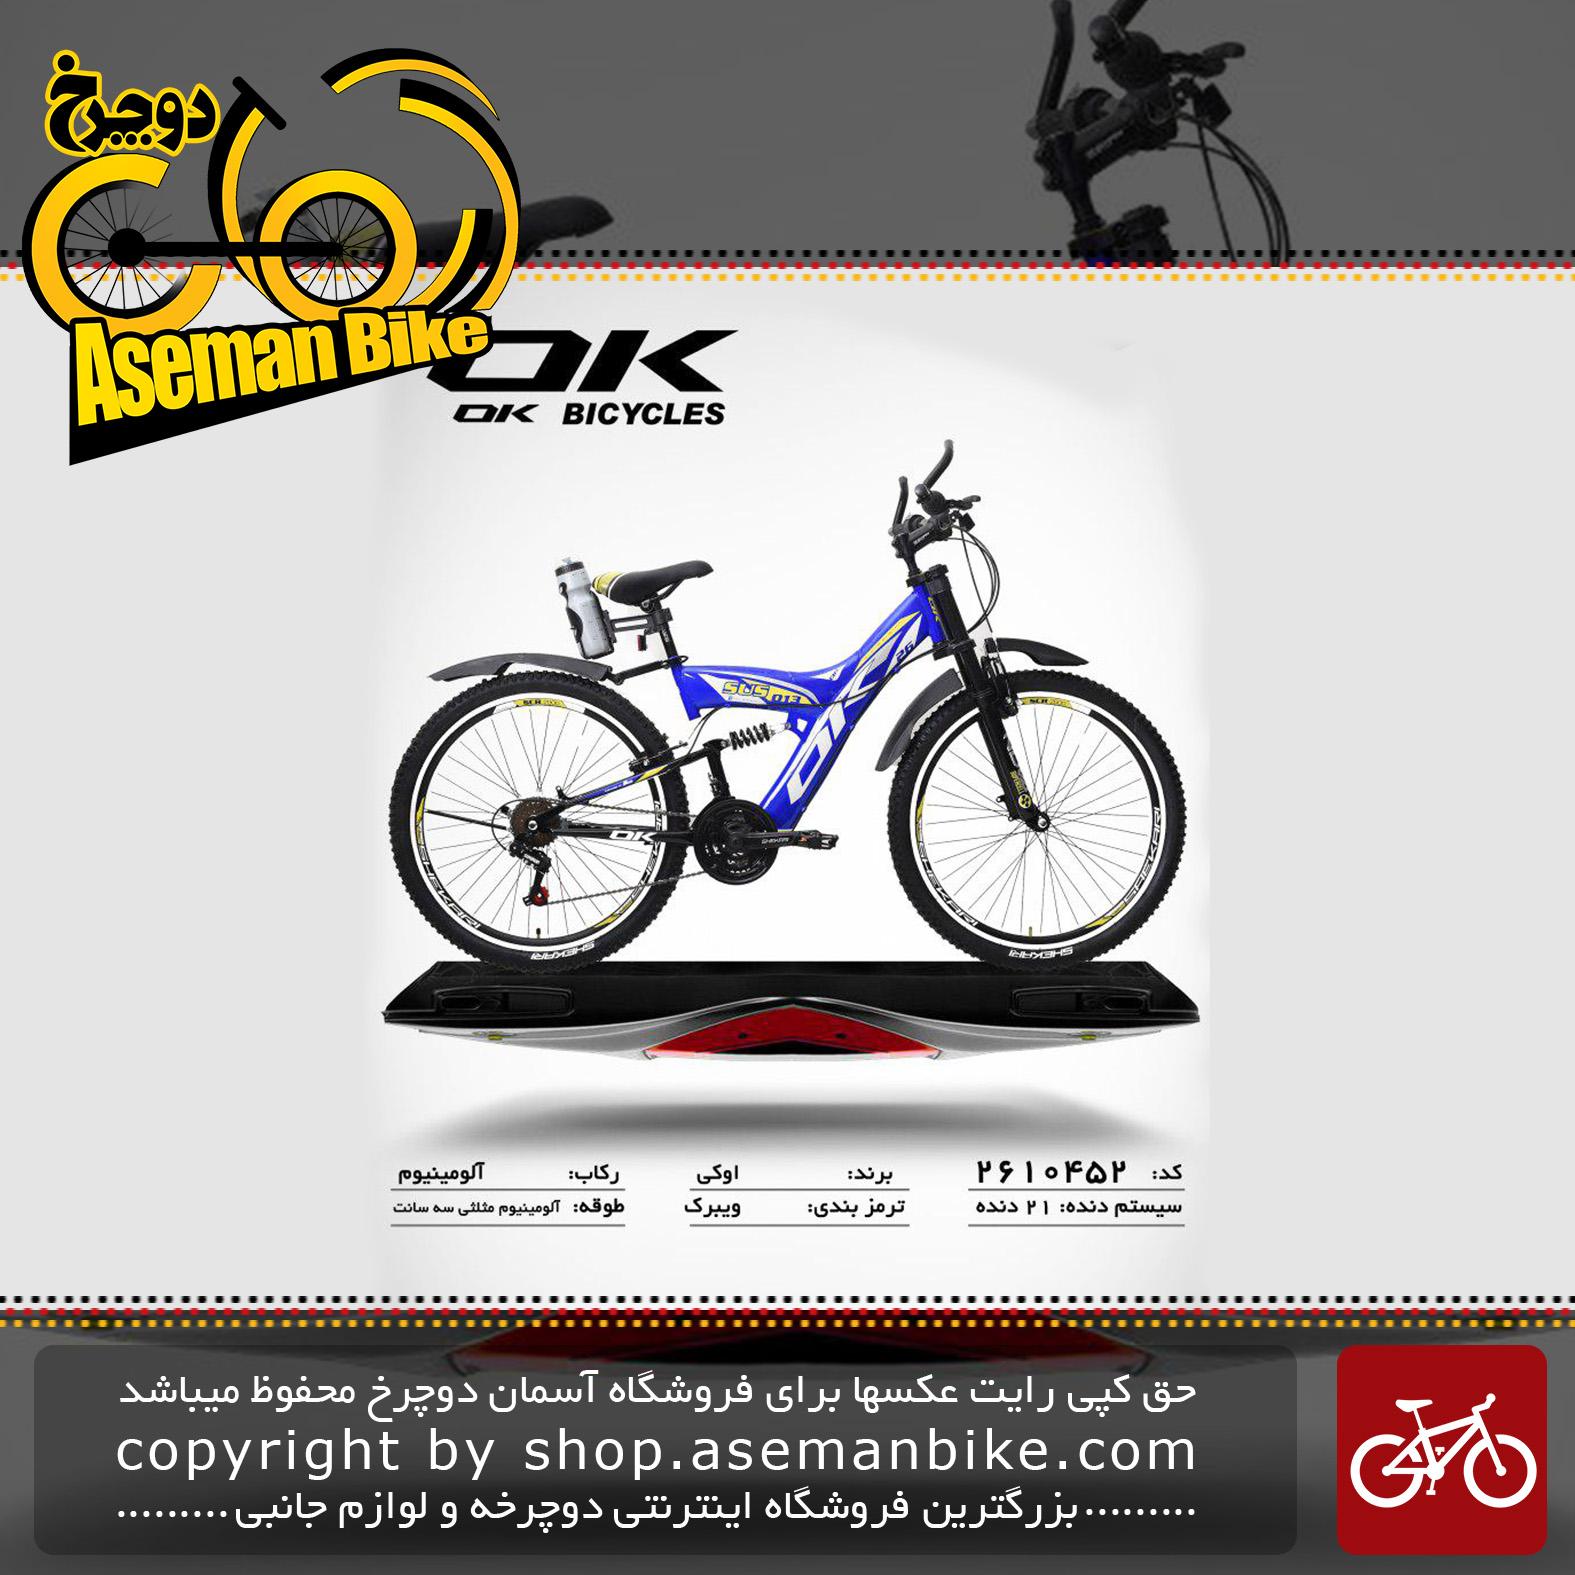 دوچرخه کوهستان شهری اوکی دو کمک مدل 452 21 دنده سایز 26 ساخت تایوان OK Mountain City Bicycle Taiwan 452 Size 26 21 Speed 2019